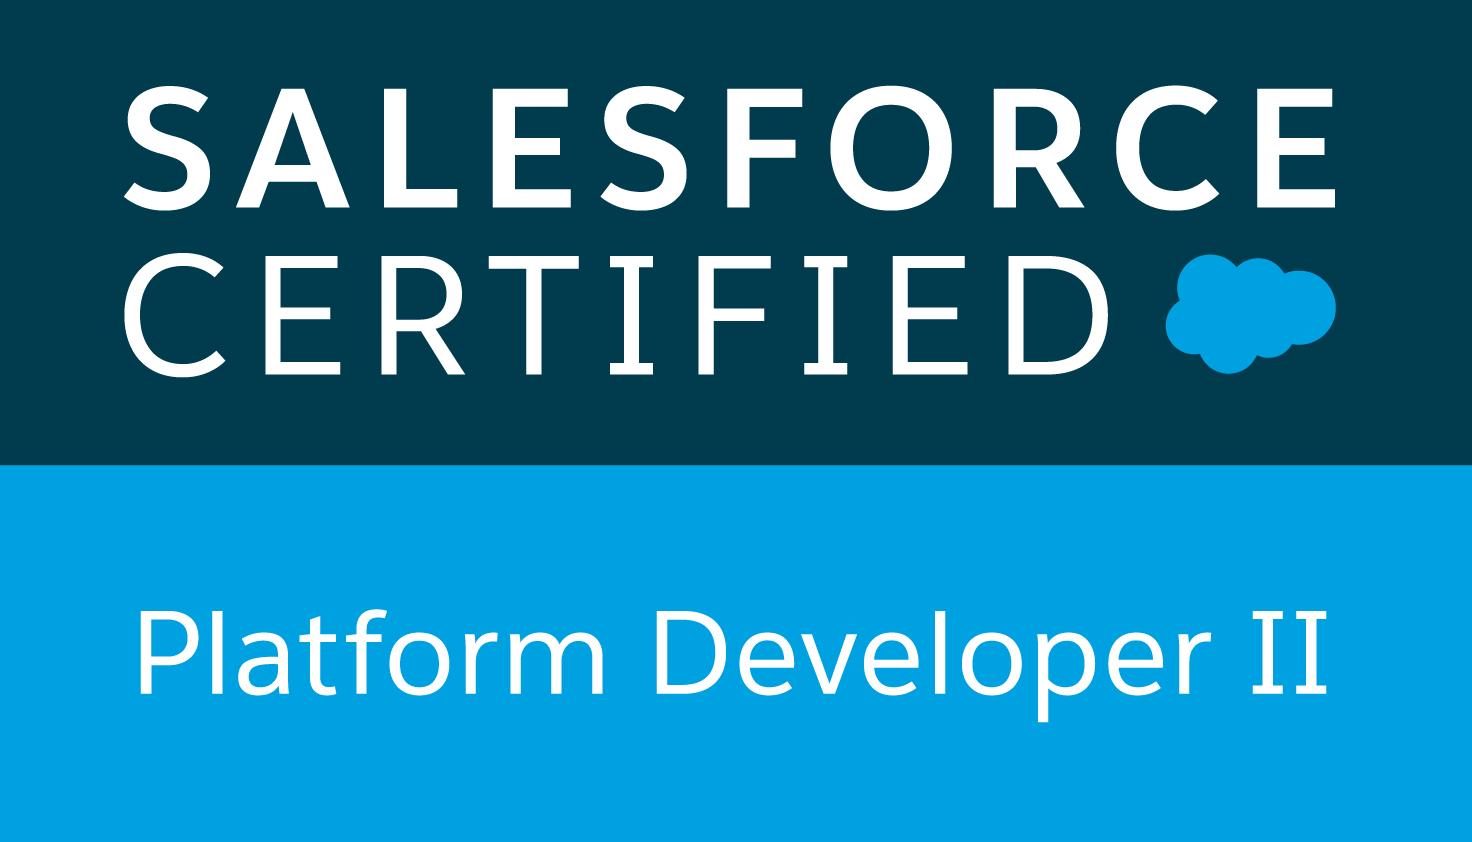 Platform Developer II